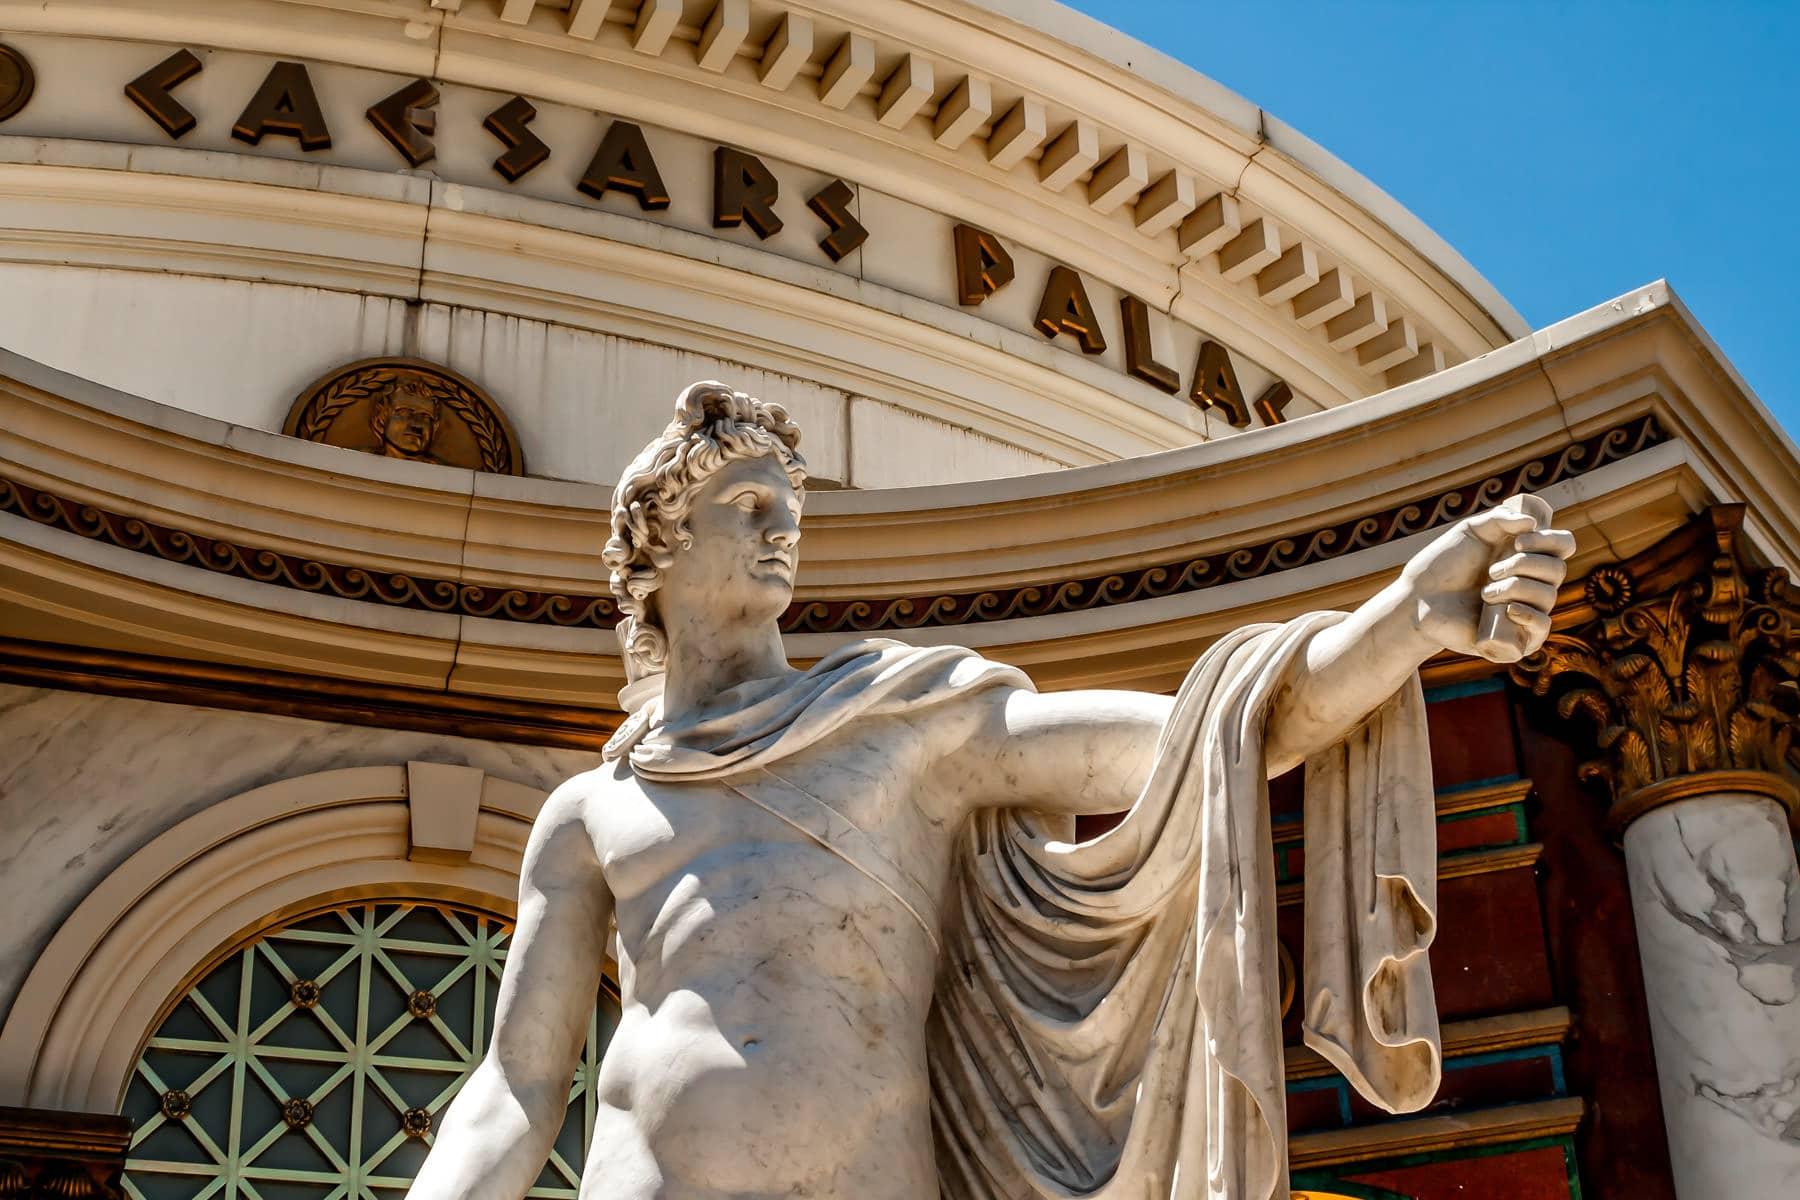 A statue at Caesars Palace, Las Vegas.